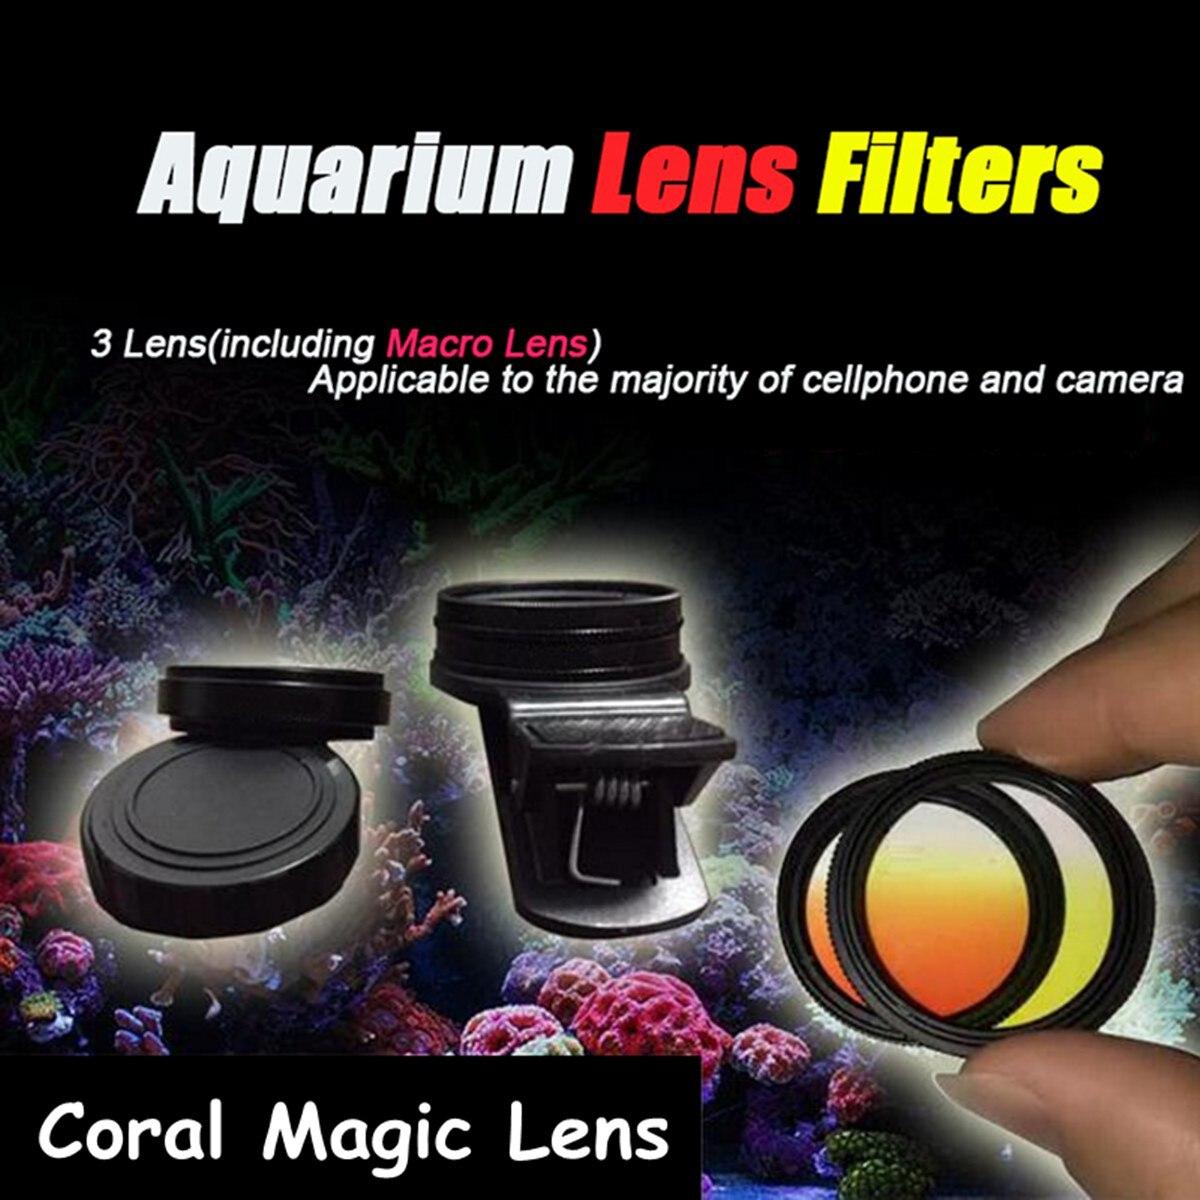 Aquarium Fish Tank Coral Reef Lens Phone Camera Filters Lens + 1 Macro Lens Fish Aquatic Terrarium Accessories